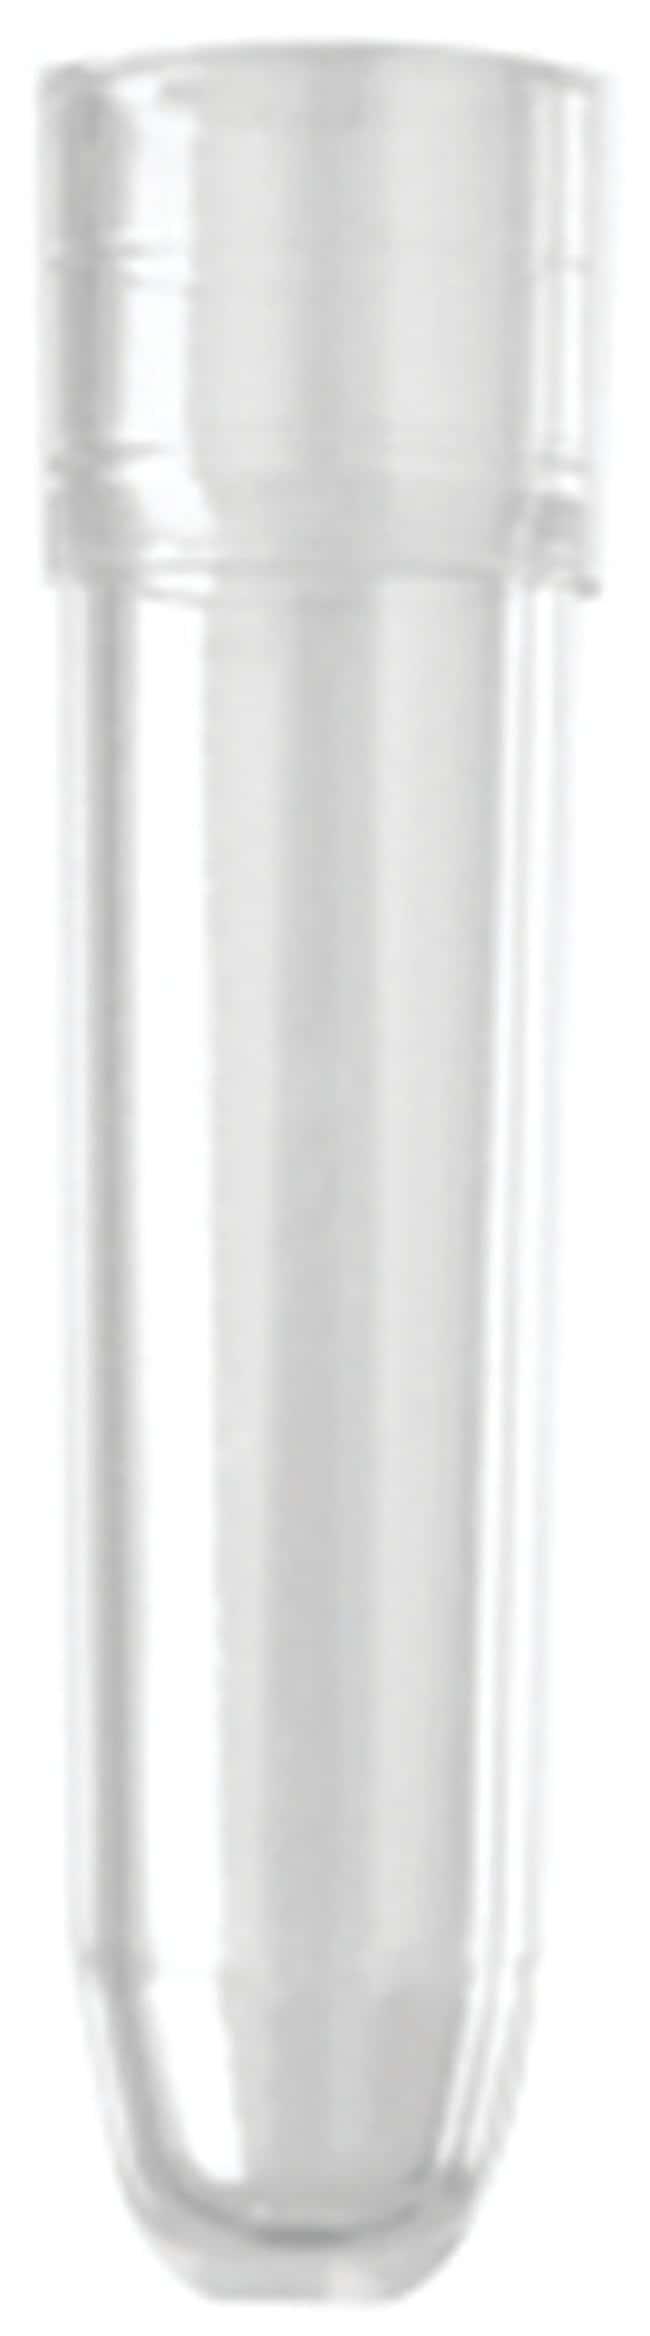 Sistema de minitubos Axygen™ Mini tube; Single; 0.65mL Sistema de minitubos Axygen™